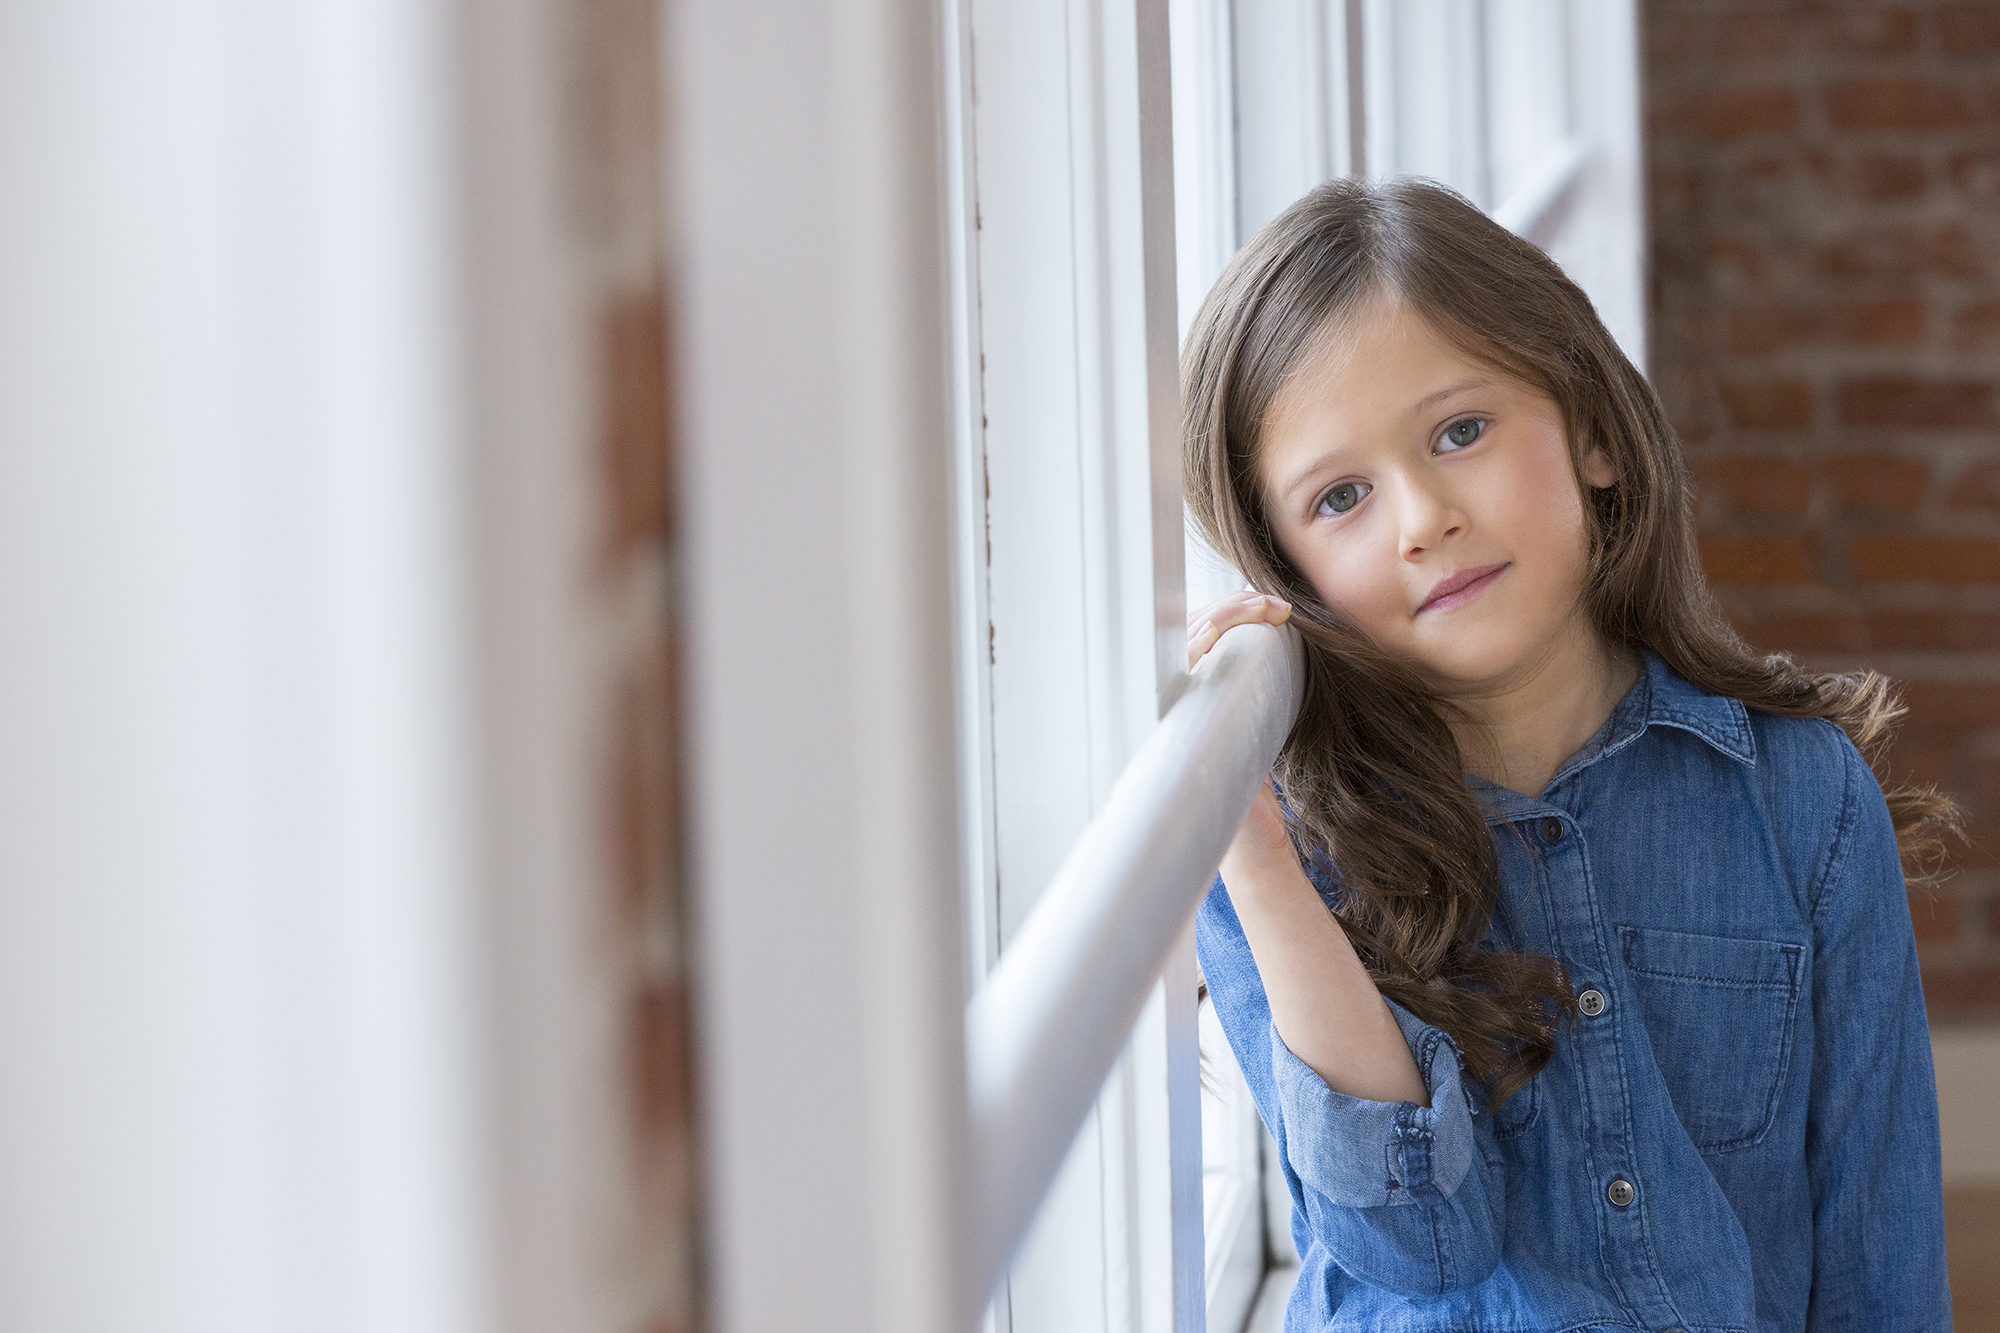 Little girl from corvallis